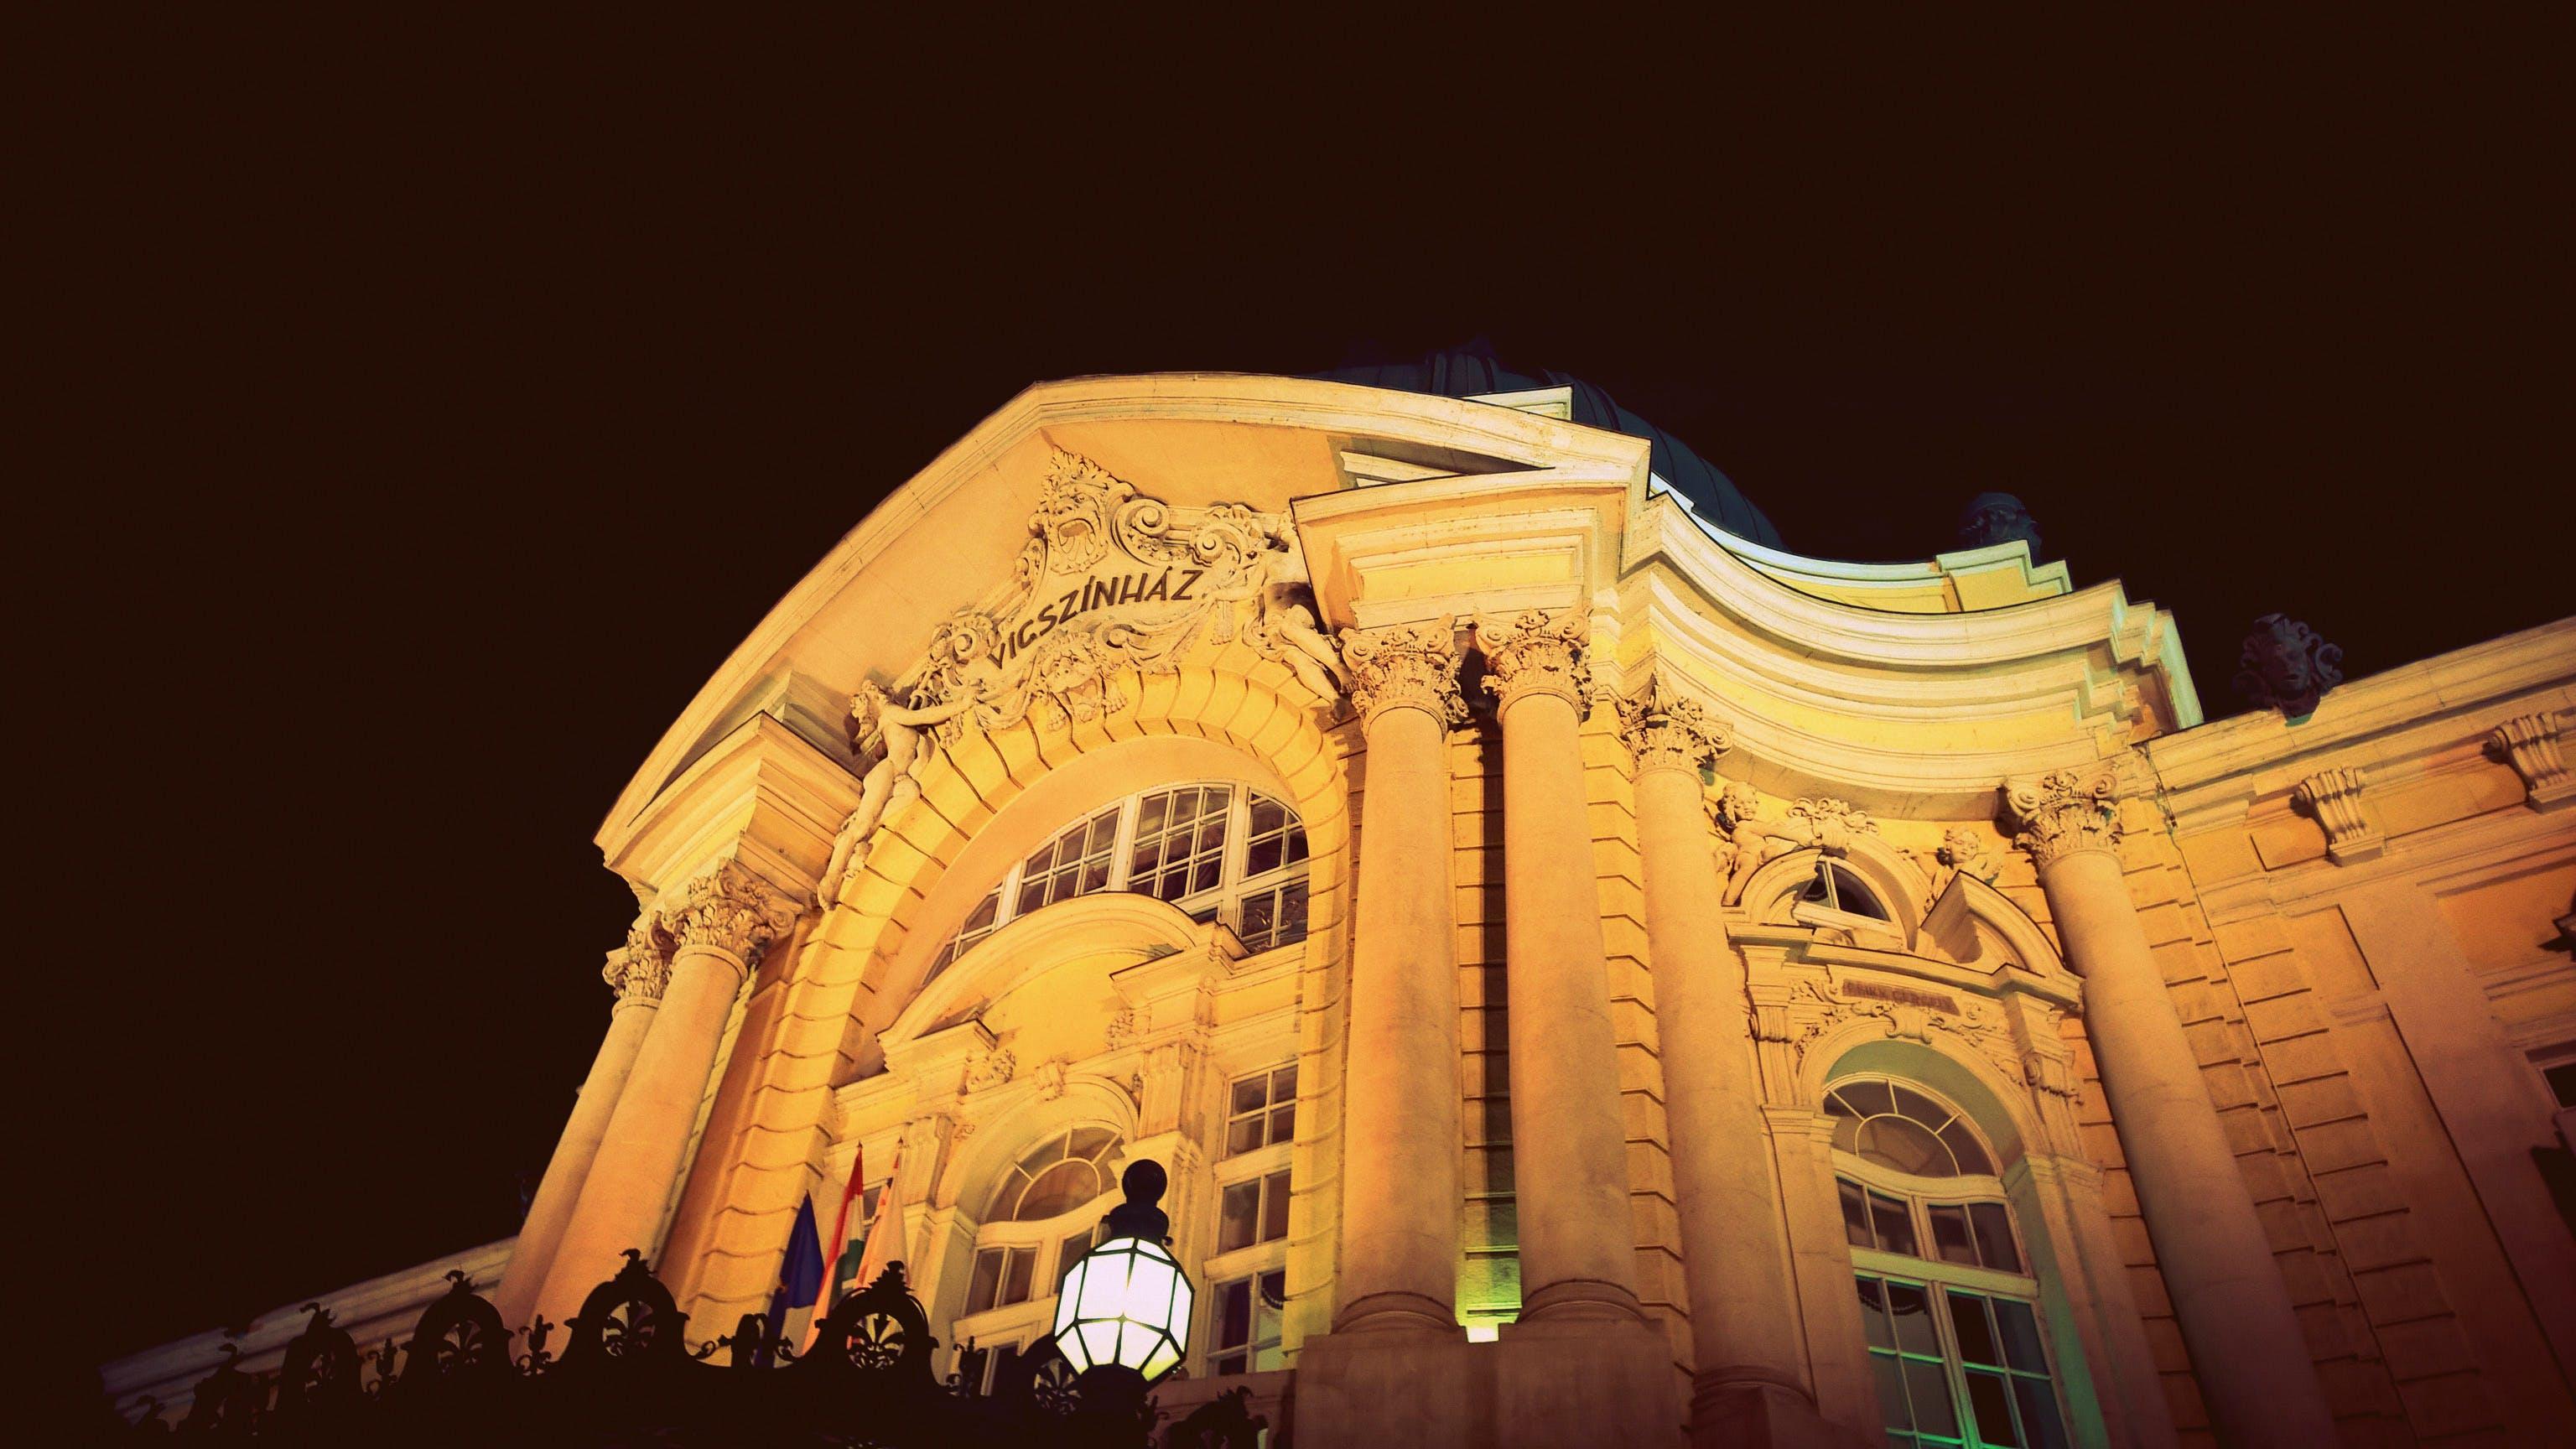 Free stock photo of night, architecture, hungary, Budapest